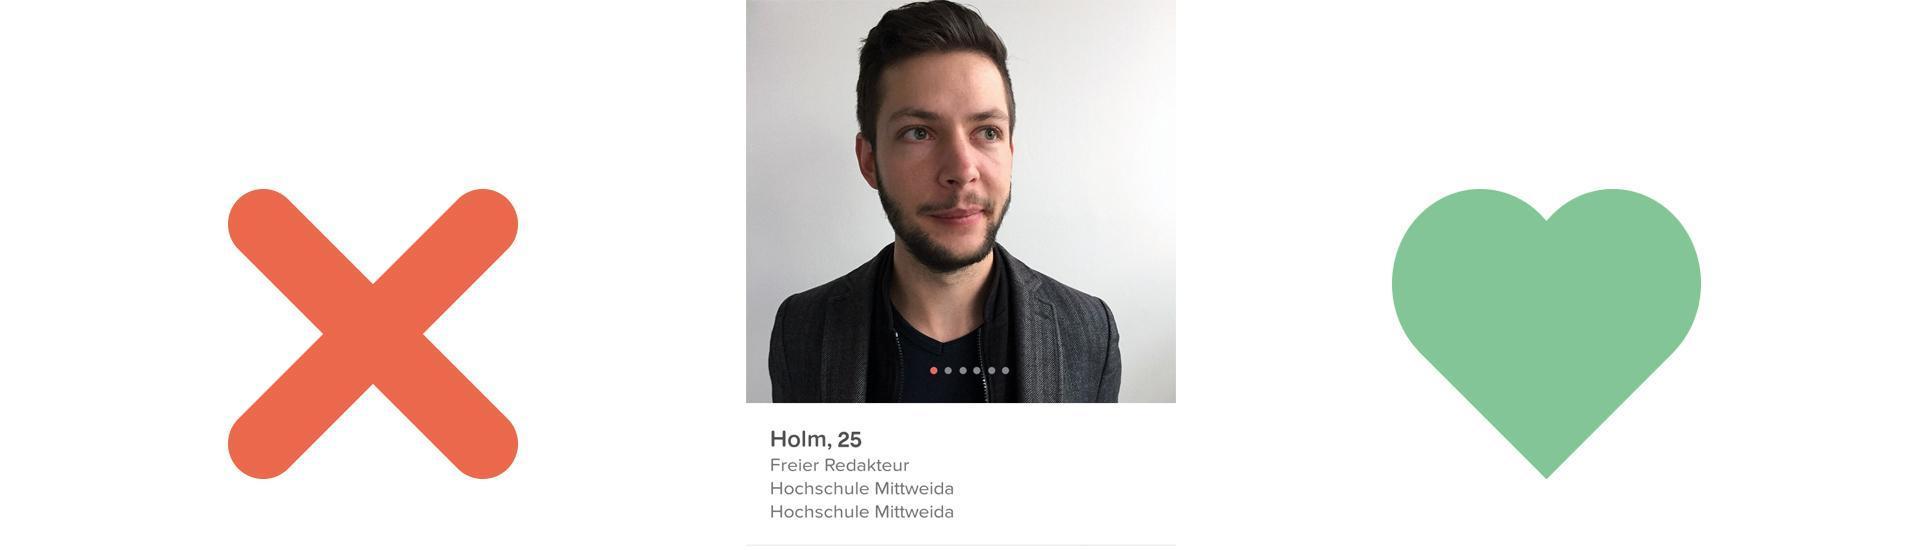 Dating-apps in meiner nähe